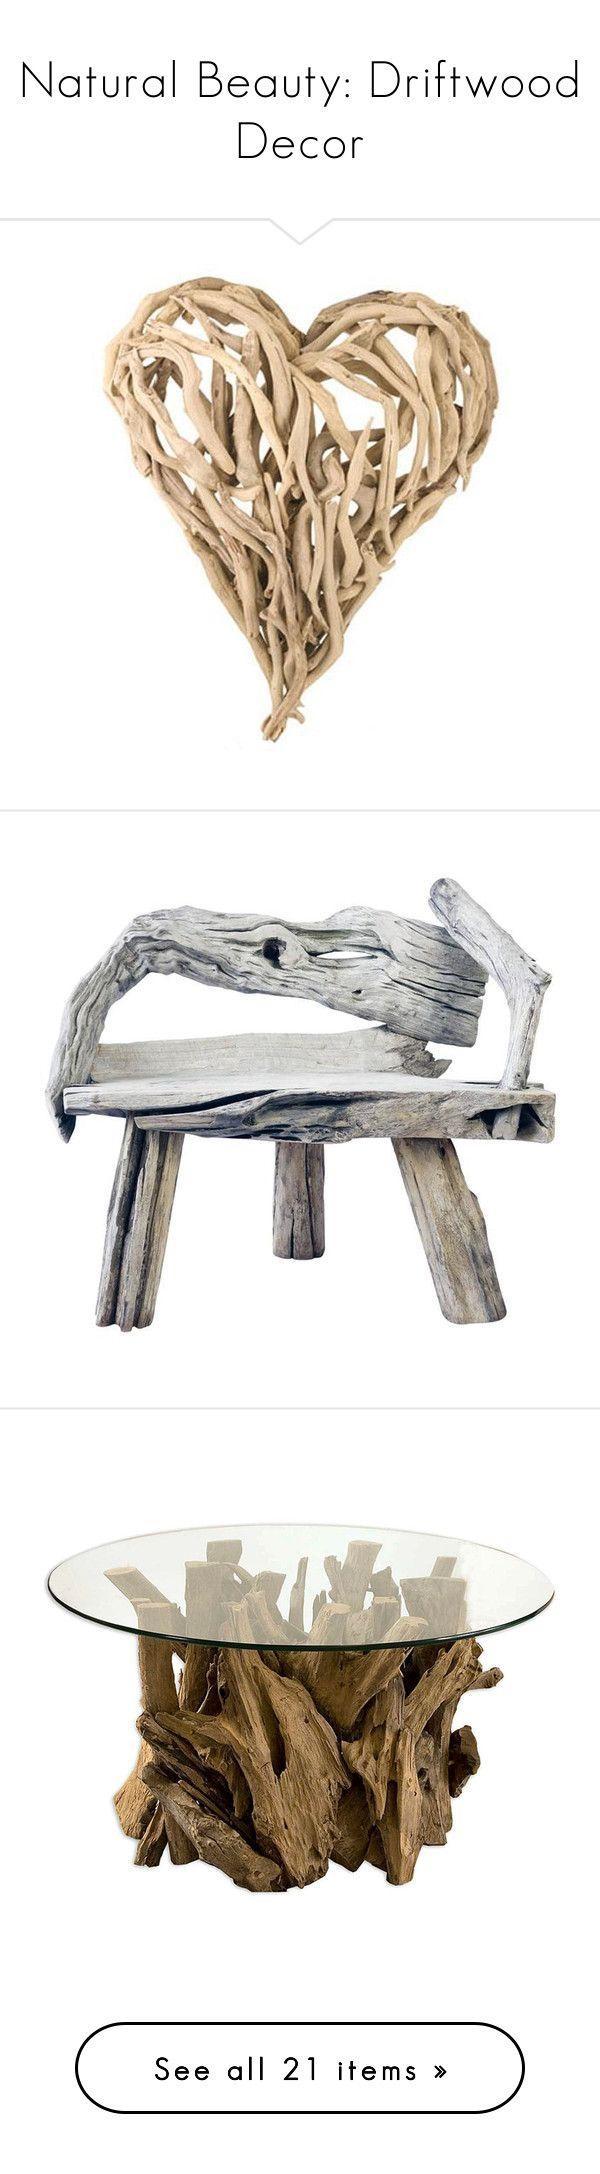 Best 25+ Driftwood Wall Art Ideas On Pinterest | Driftwood Crafts Pertaining To Driftwood Heart Wall Art (Image 8 of 20)